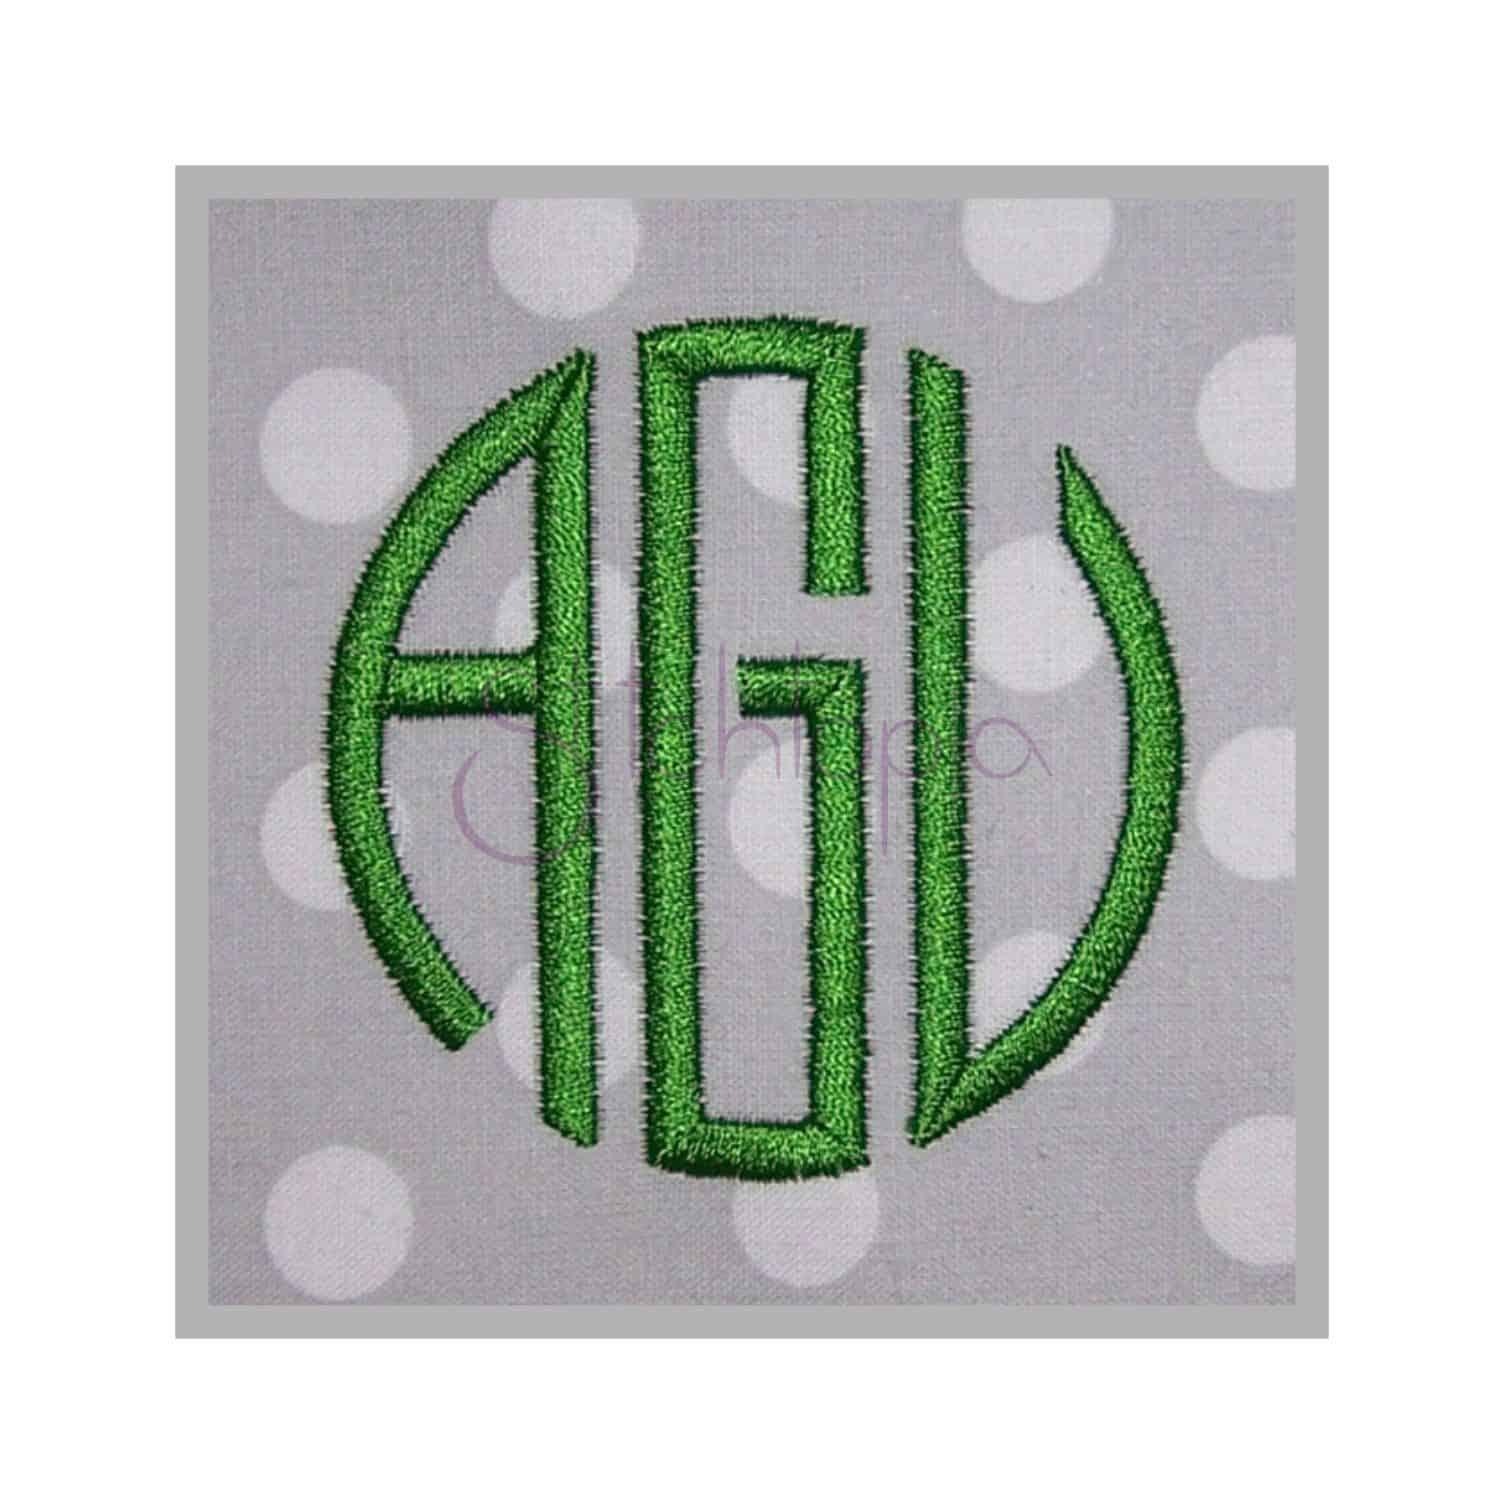 Circle 3 Letter Monogram Font Thin 5 75 1 1 5 2 2 5 Stitchtopia